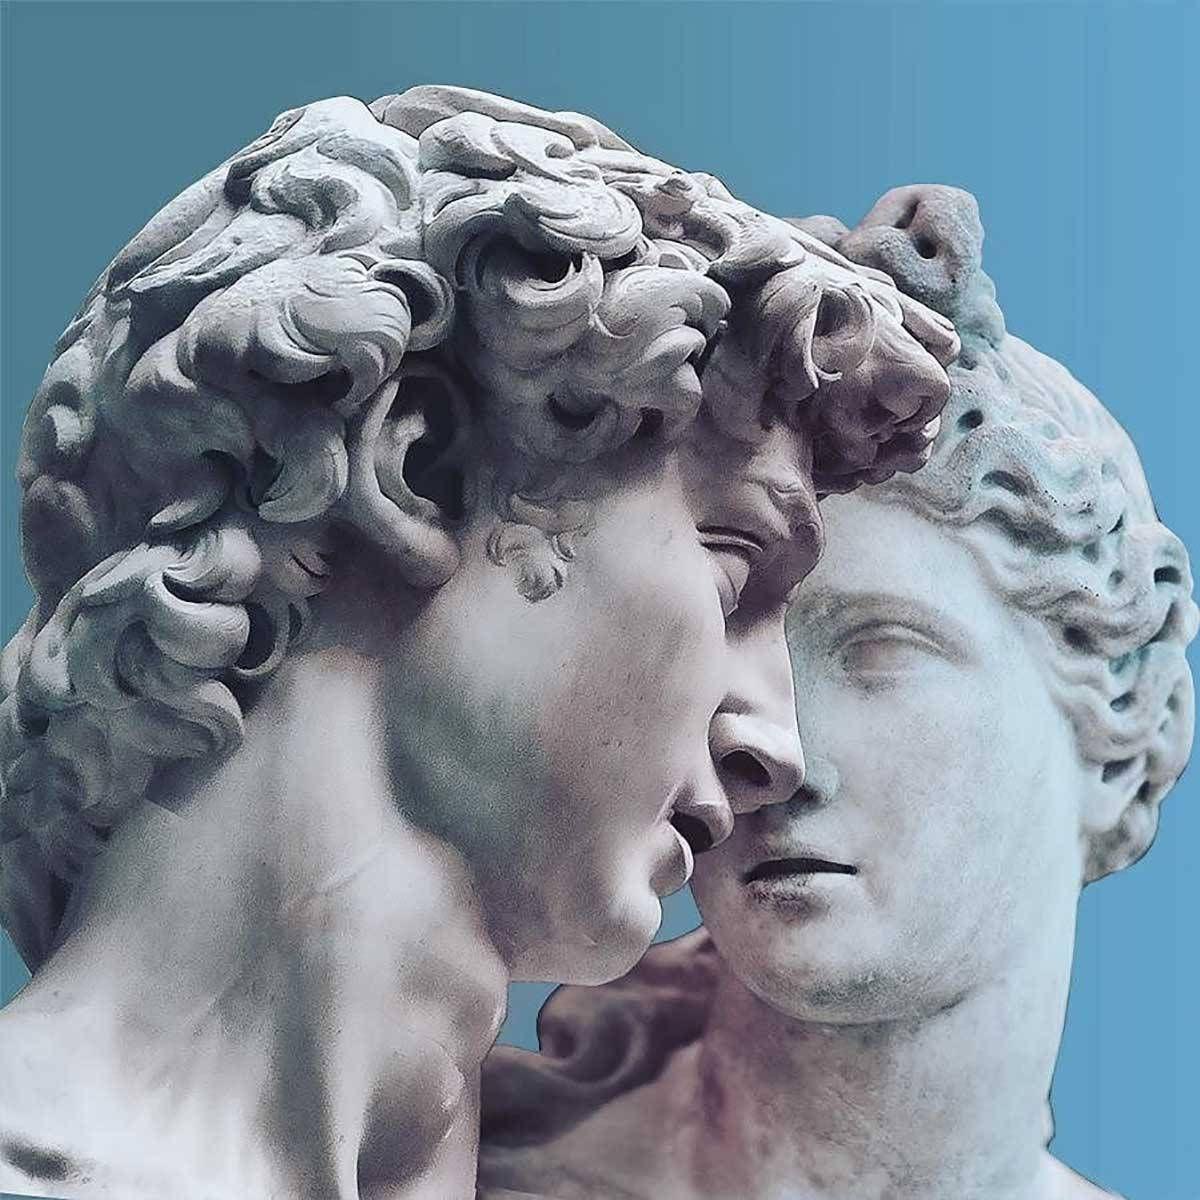 Playful Greek Statues Dan Cretu 07 In 2019 Greek Statues